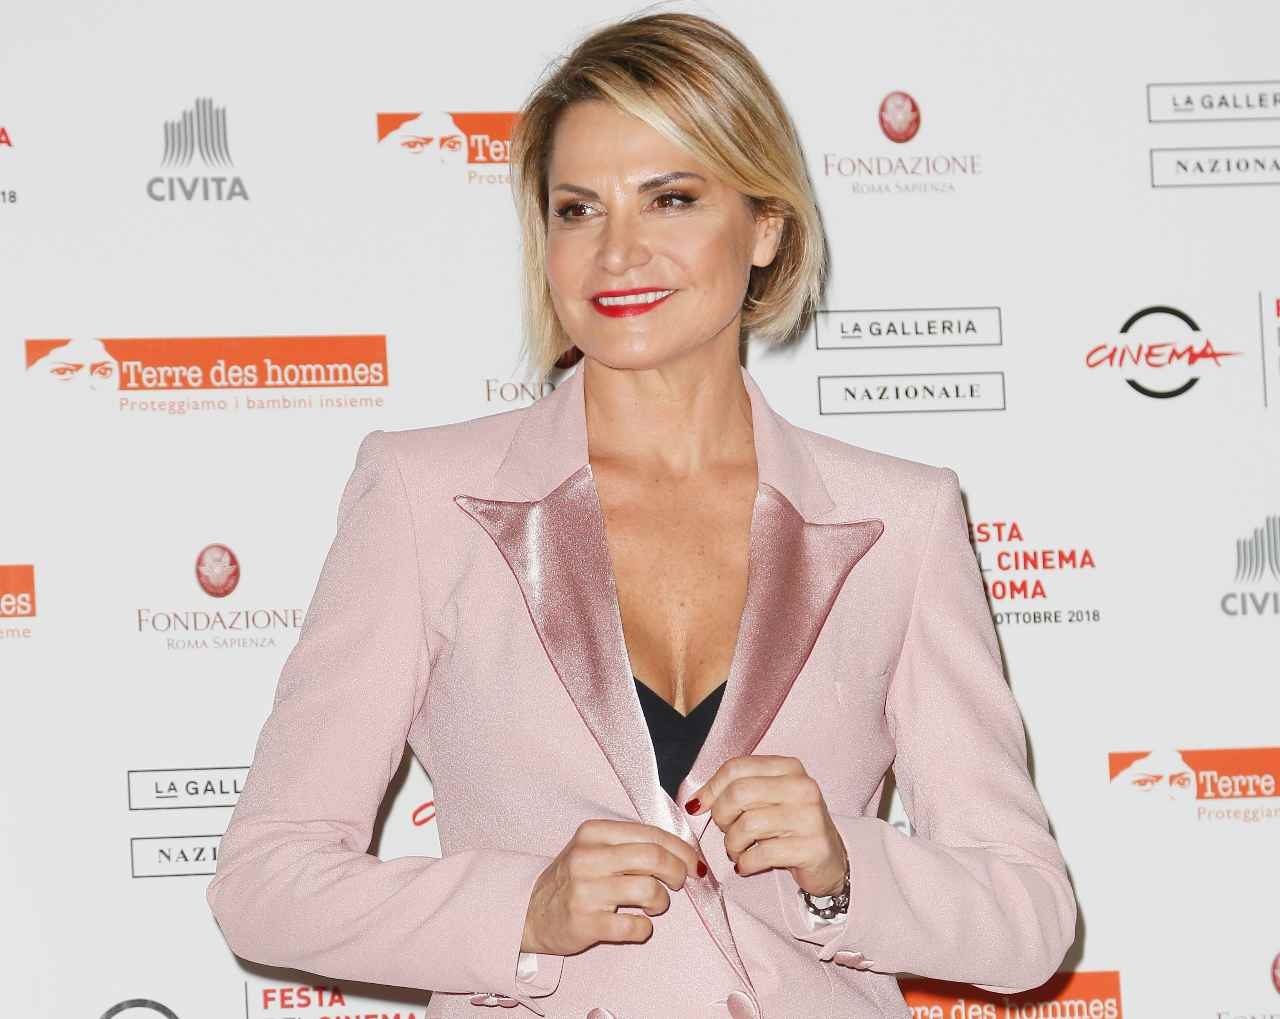 Simona Ventura (Getty Images)